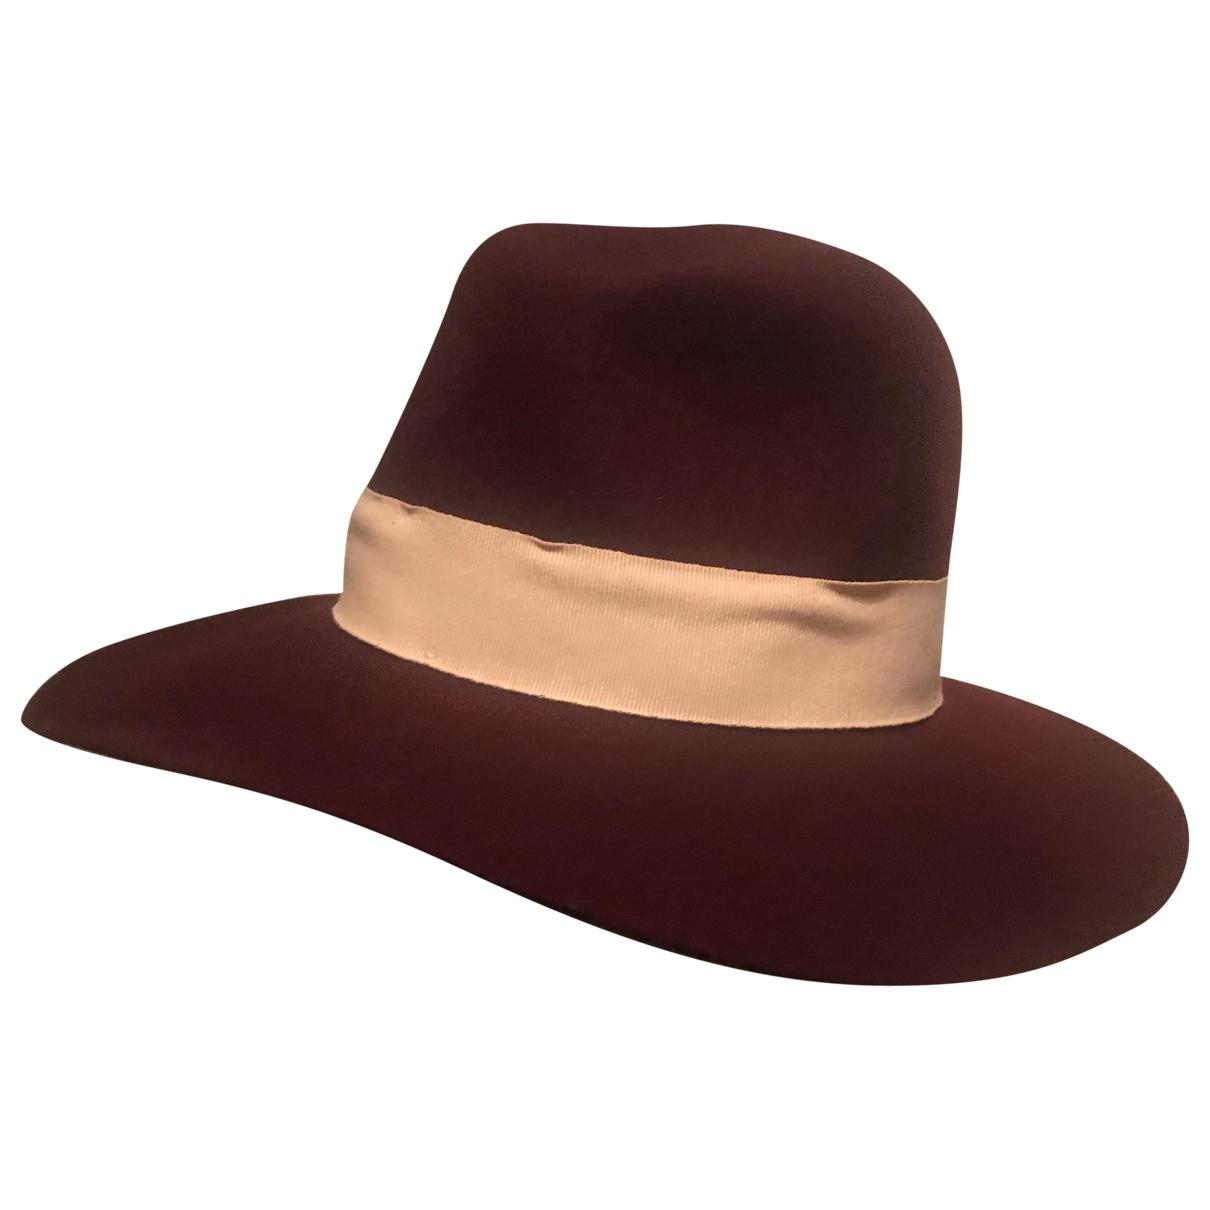 Supertrash \N Burgundy Wool hat for Women L International